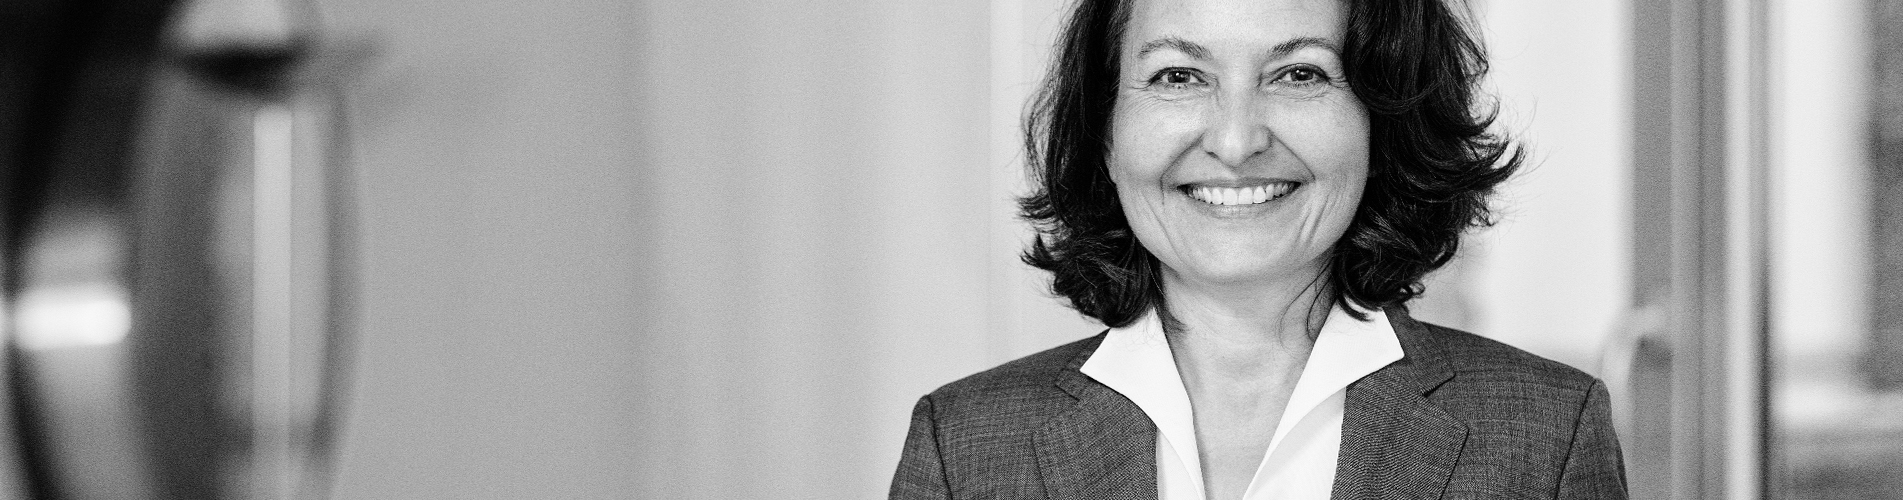 Rechtsanwältin Claudia Lützeler